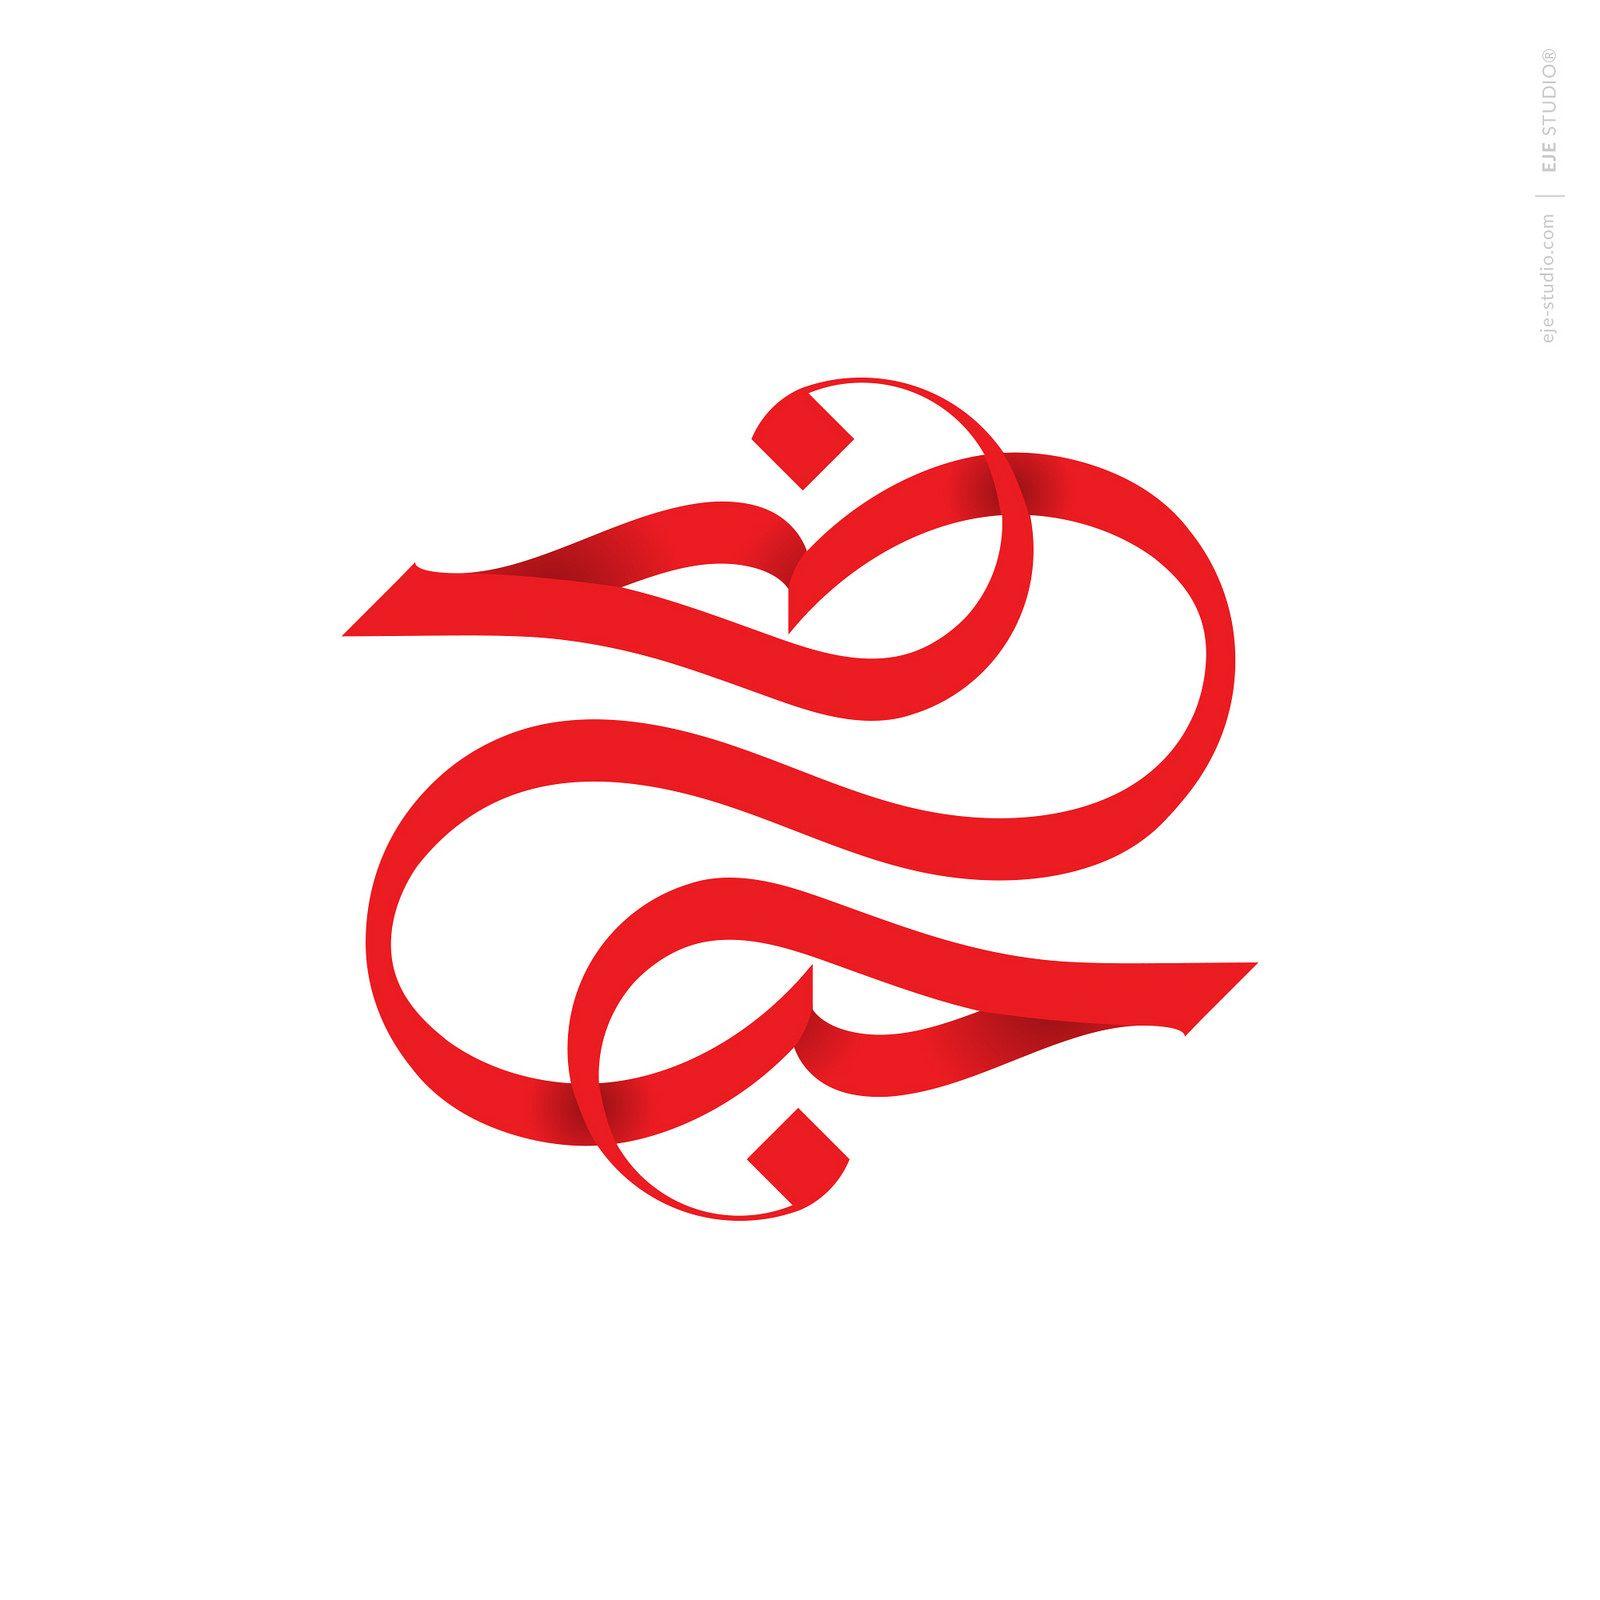 Love modern arabic calligraphy by eje studio ebrahim jaffar love modern arabic calligraphy by eje studio ebrahim jaffar by ebrahim jaffar biocorpaavc